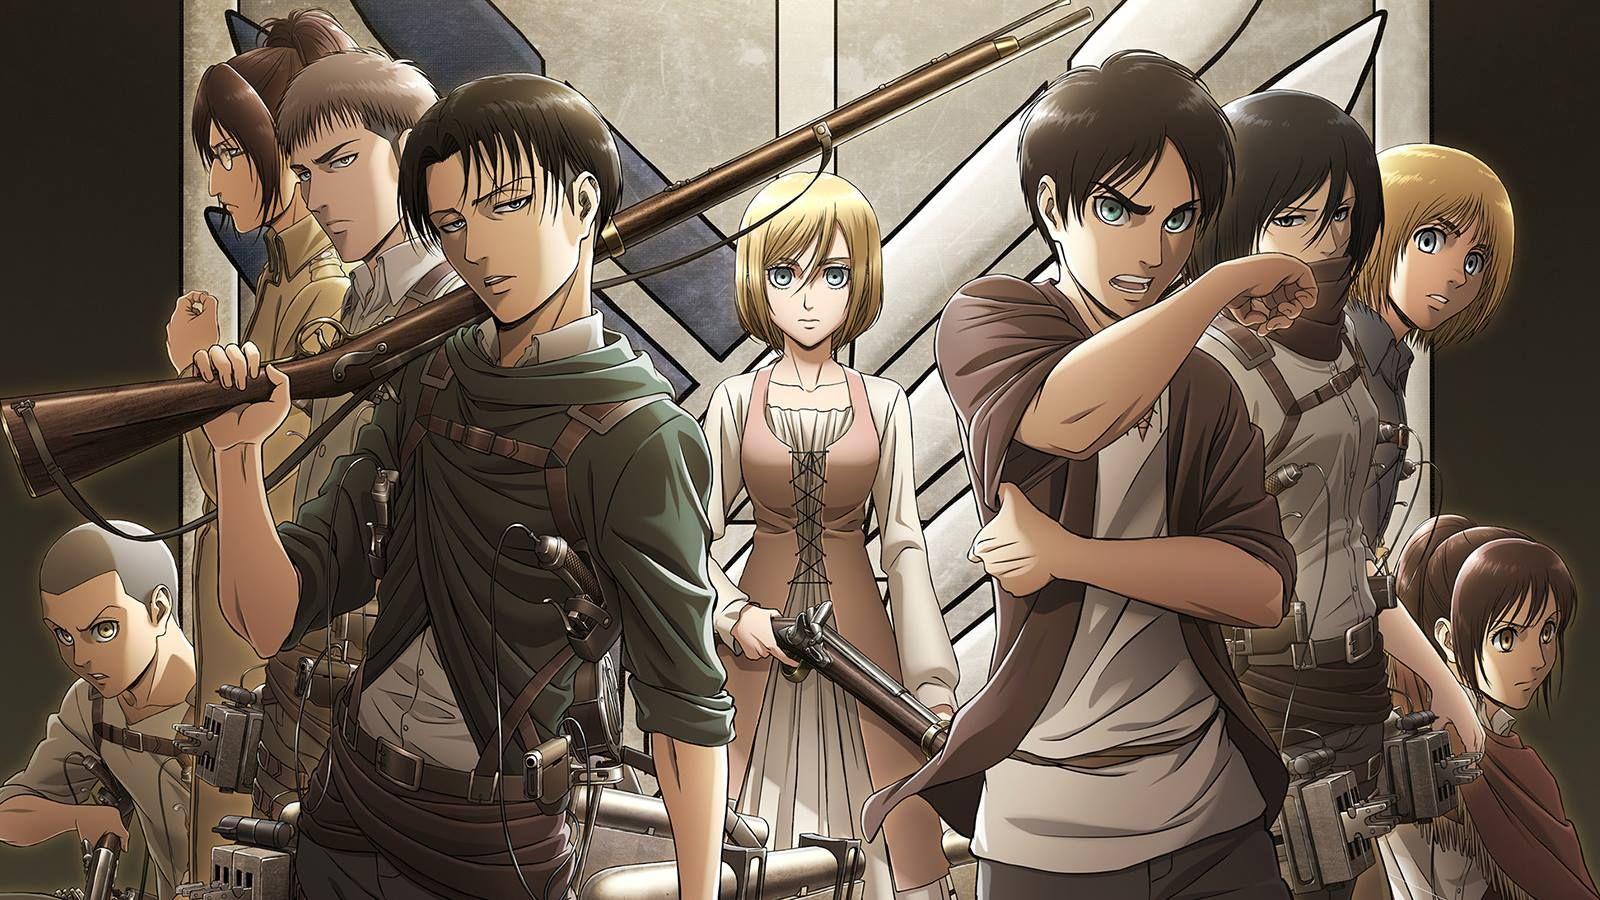 Anime Wallpaper Hd Aesthetic Anime Wallpapers Aot